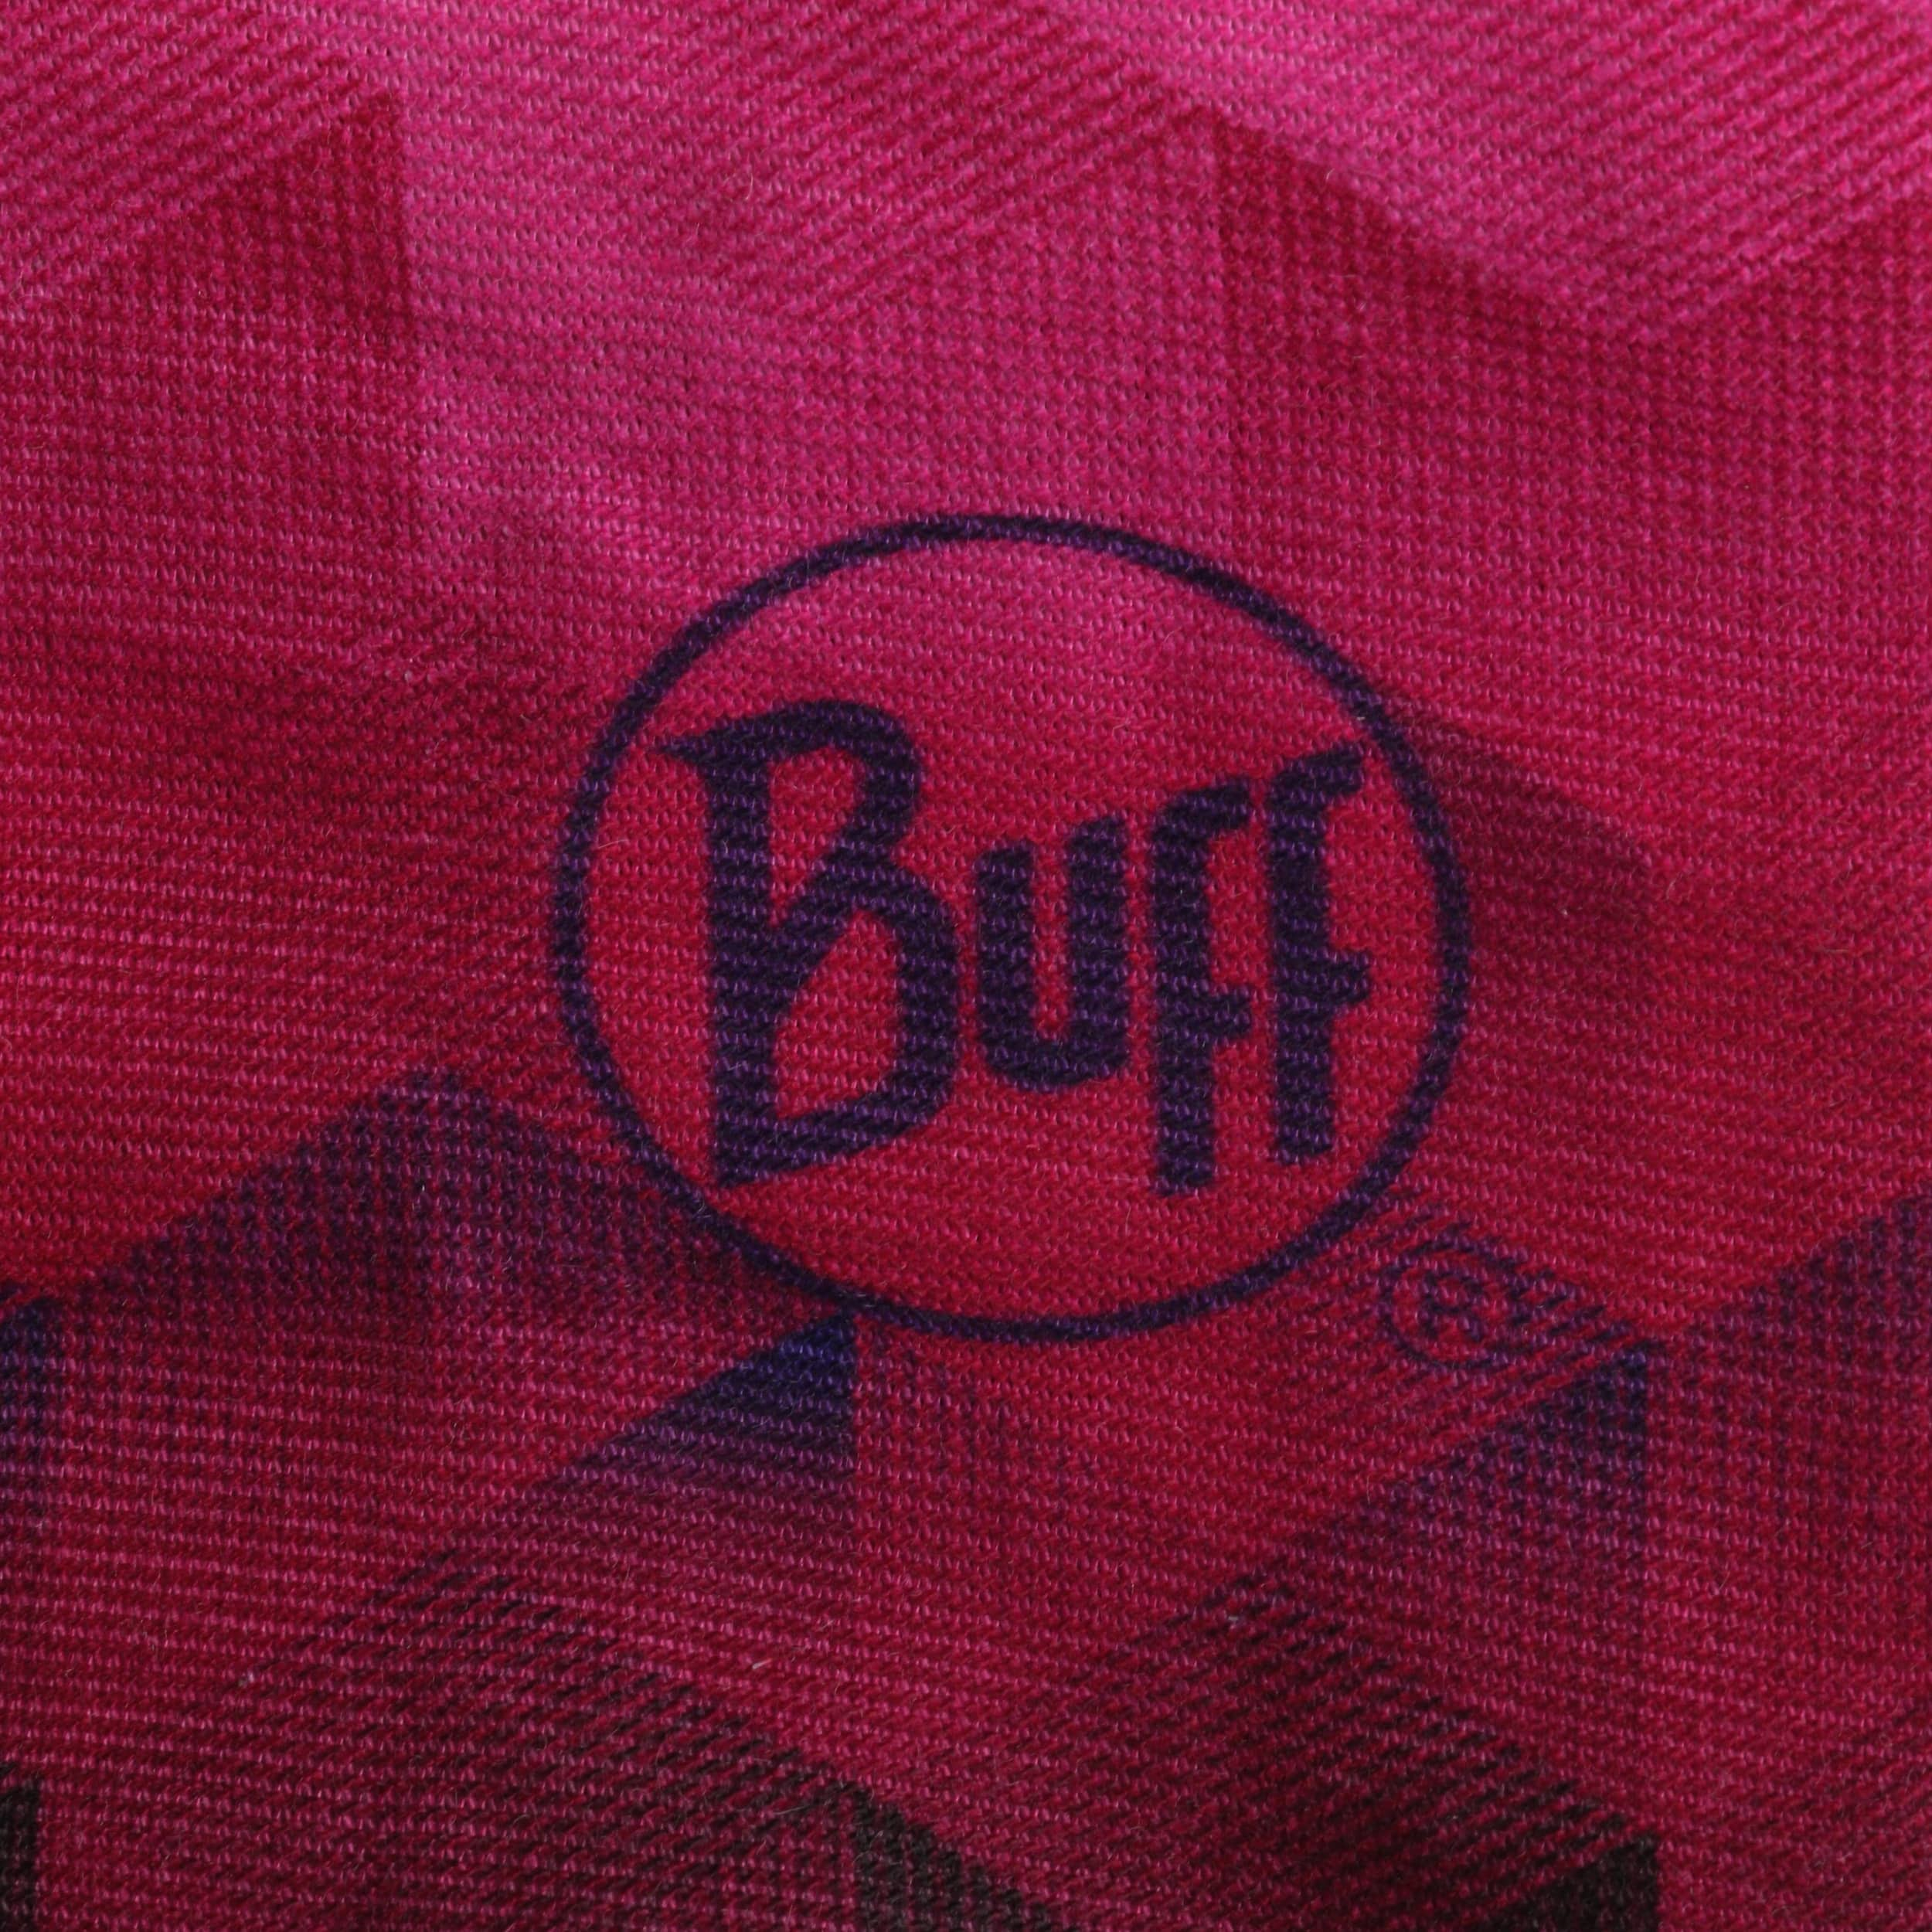 Buff Tubular Multifuncional Thermonet Tesia Cinta para la Cabeza Bandana